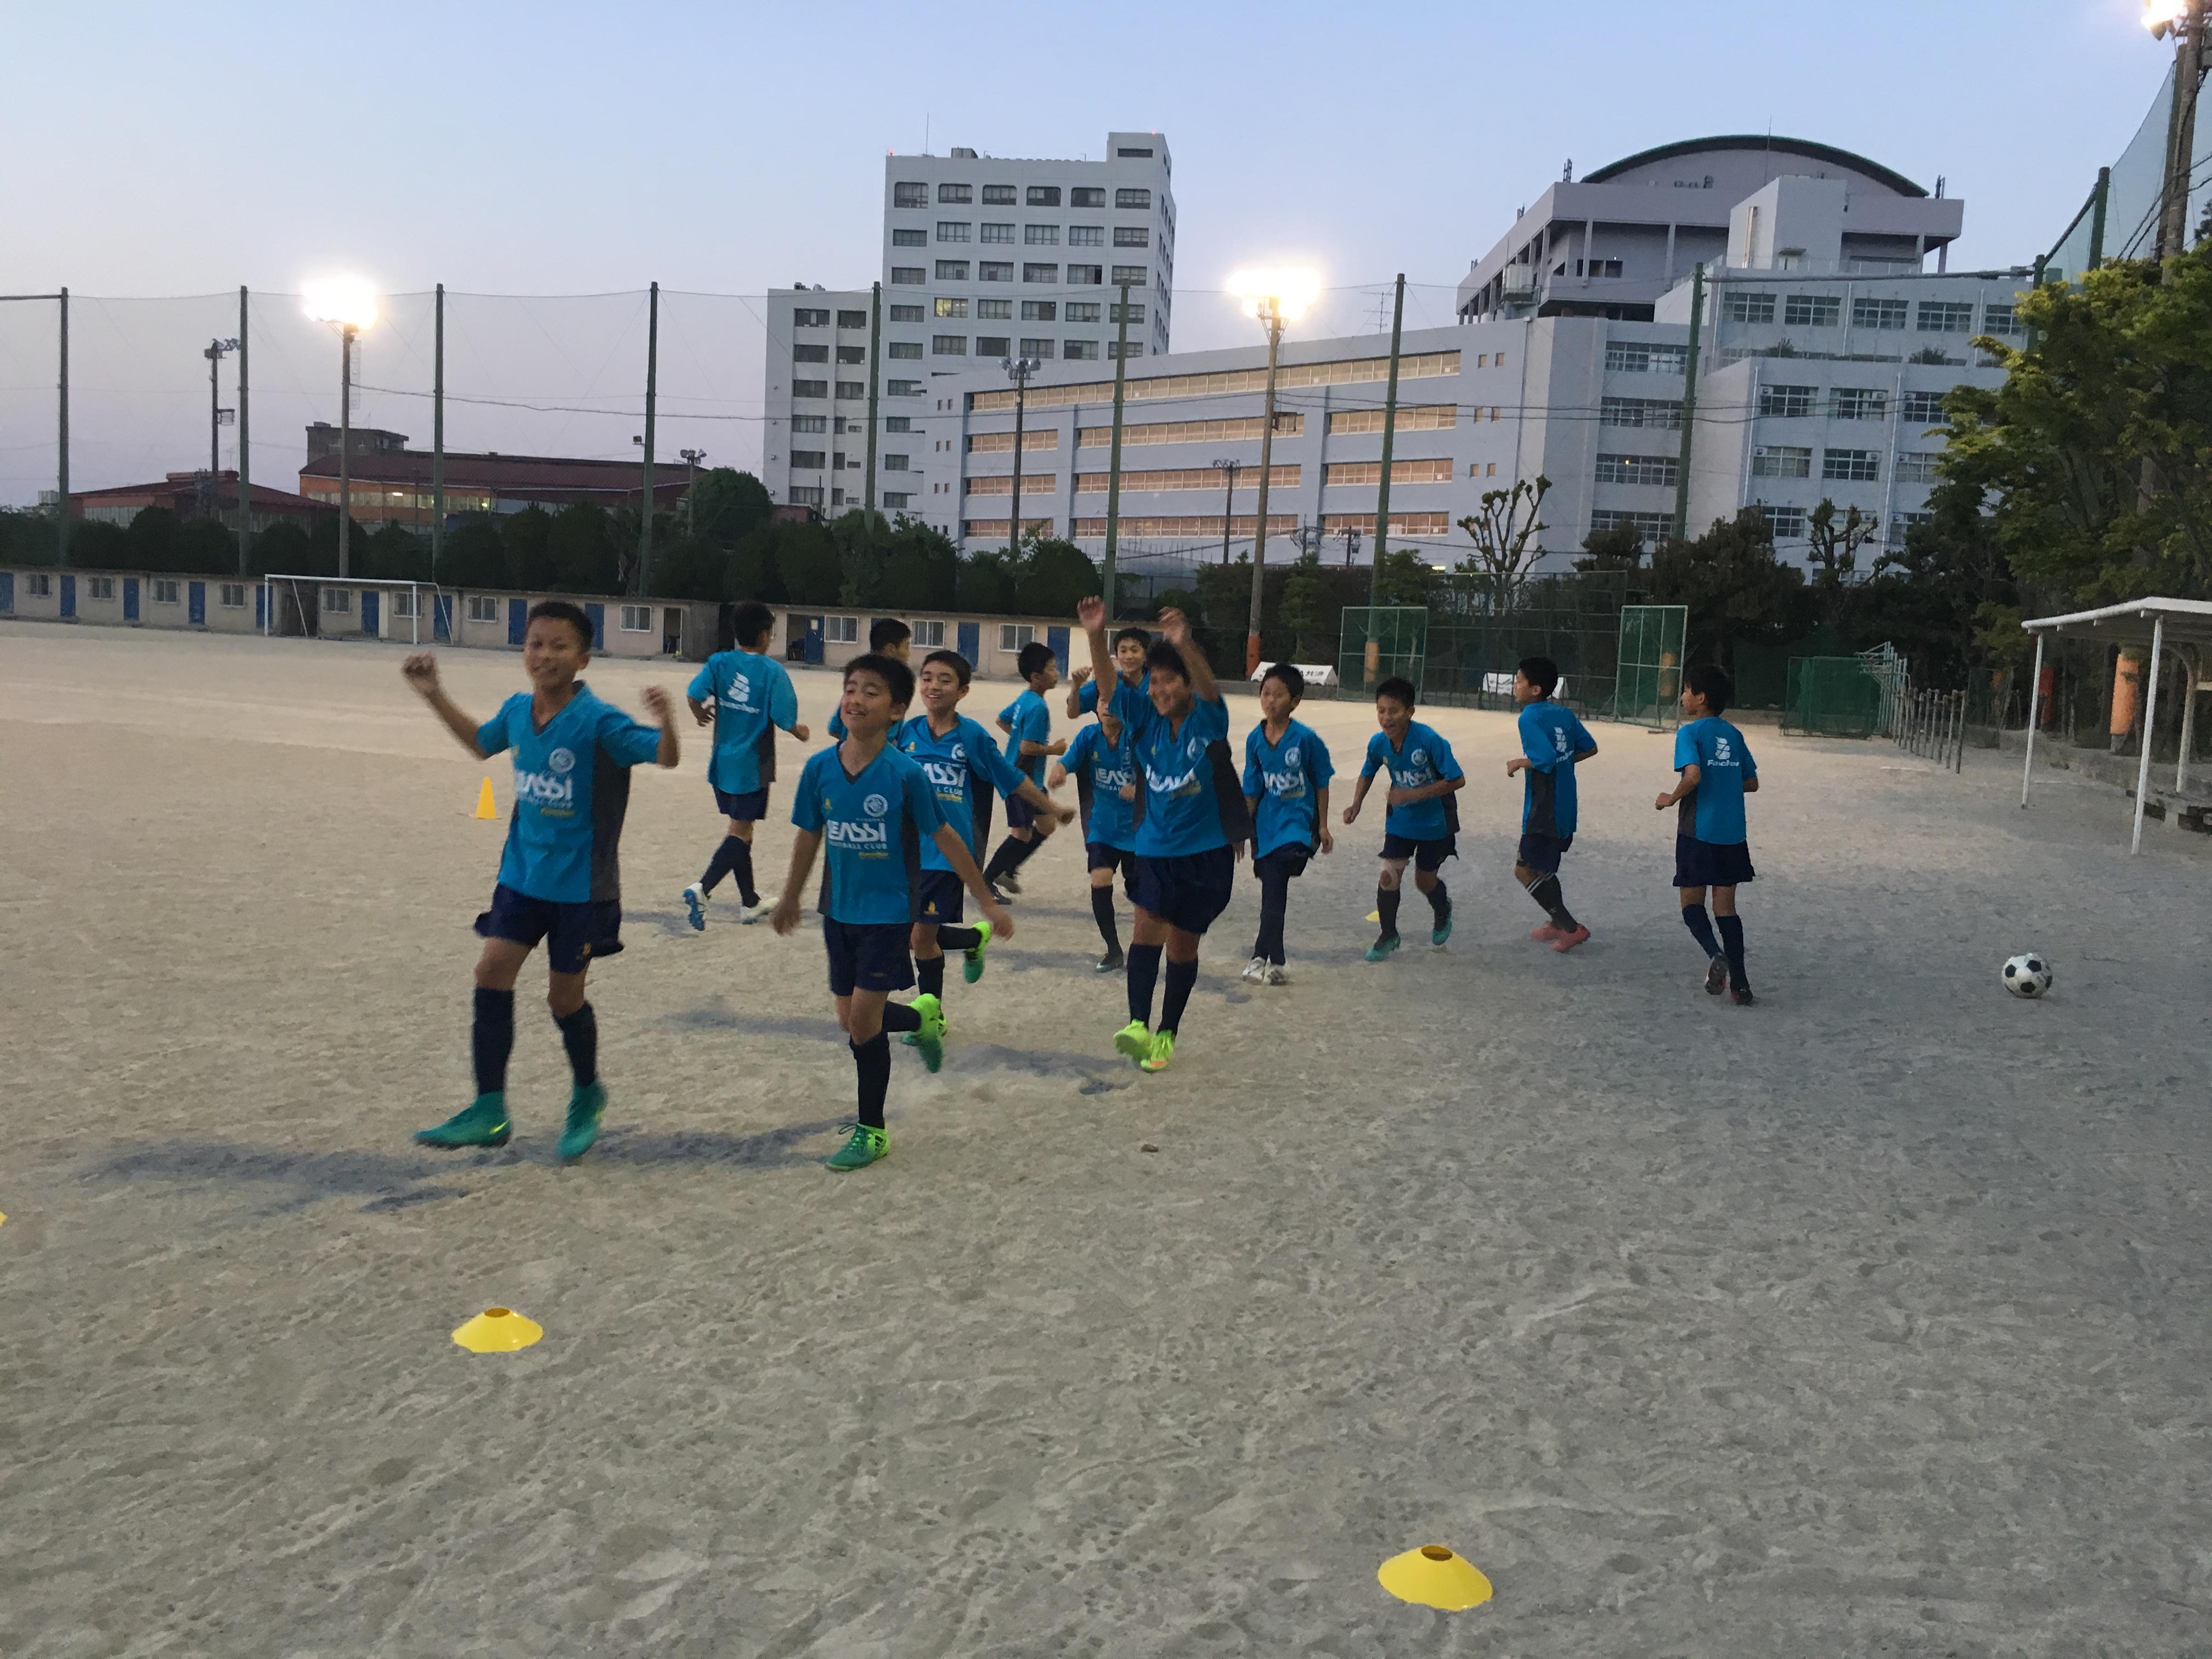 U-13 福岡県ユースサッカーリーグへ向けて